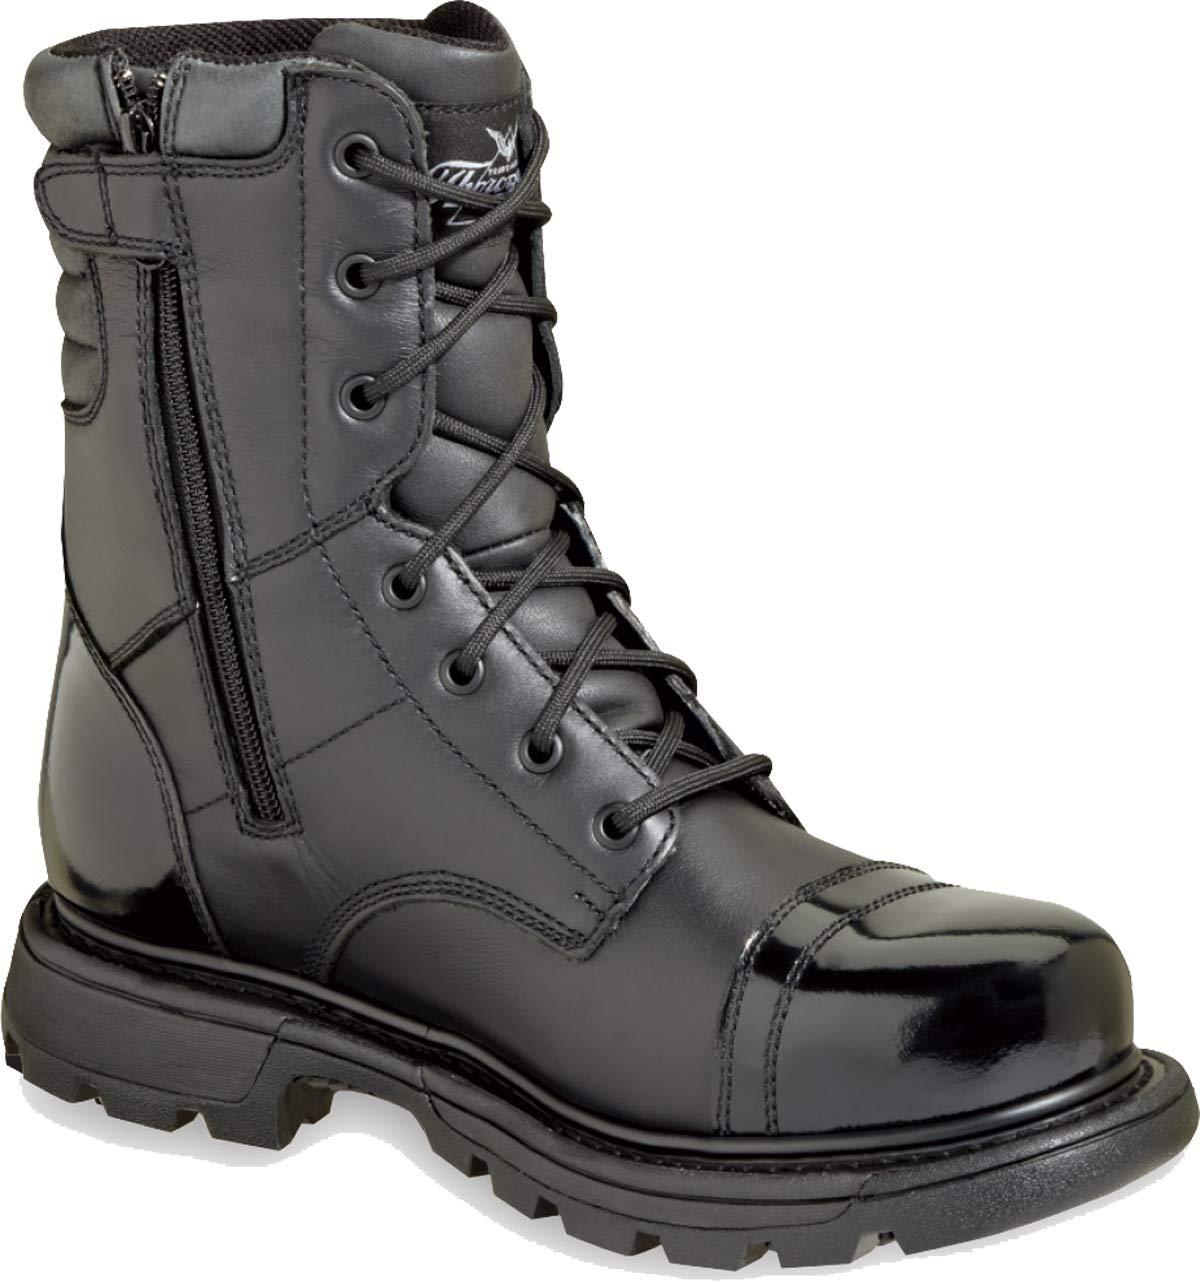 Thorogood Men's 8'' Side Zip Jump Boot Gen-flex,Black,8.5 M US by Thorogood